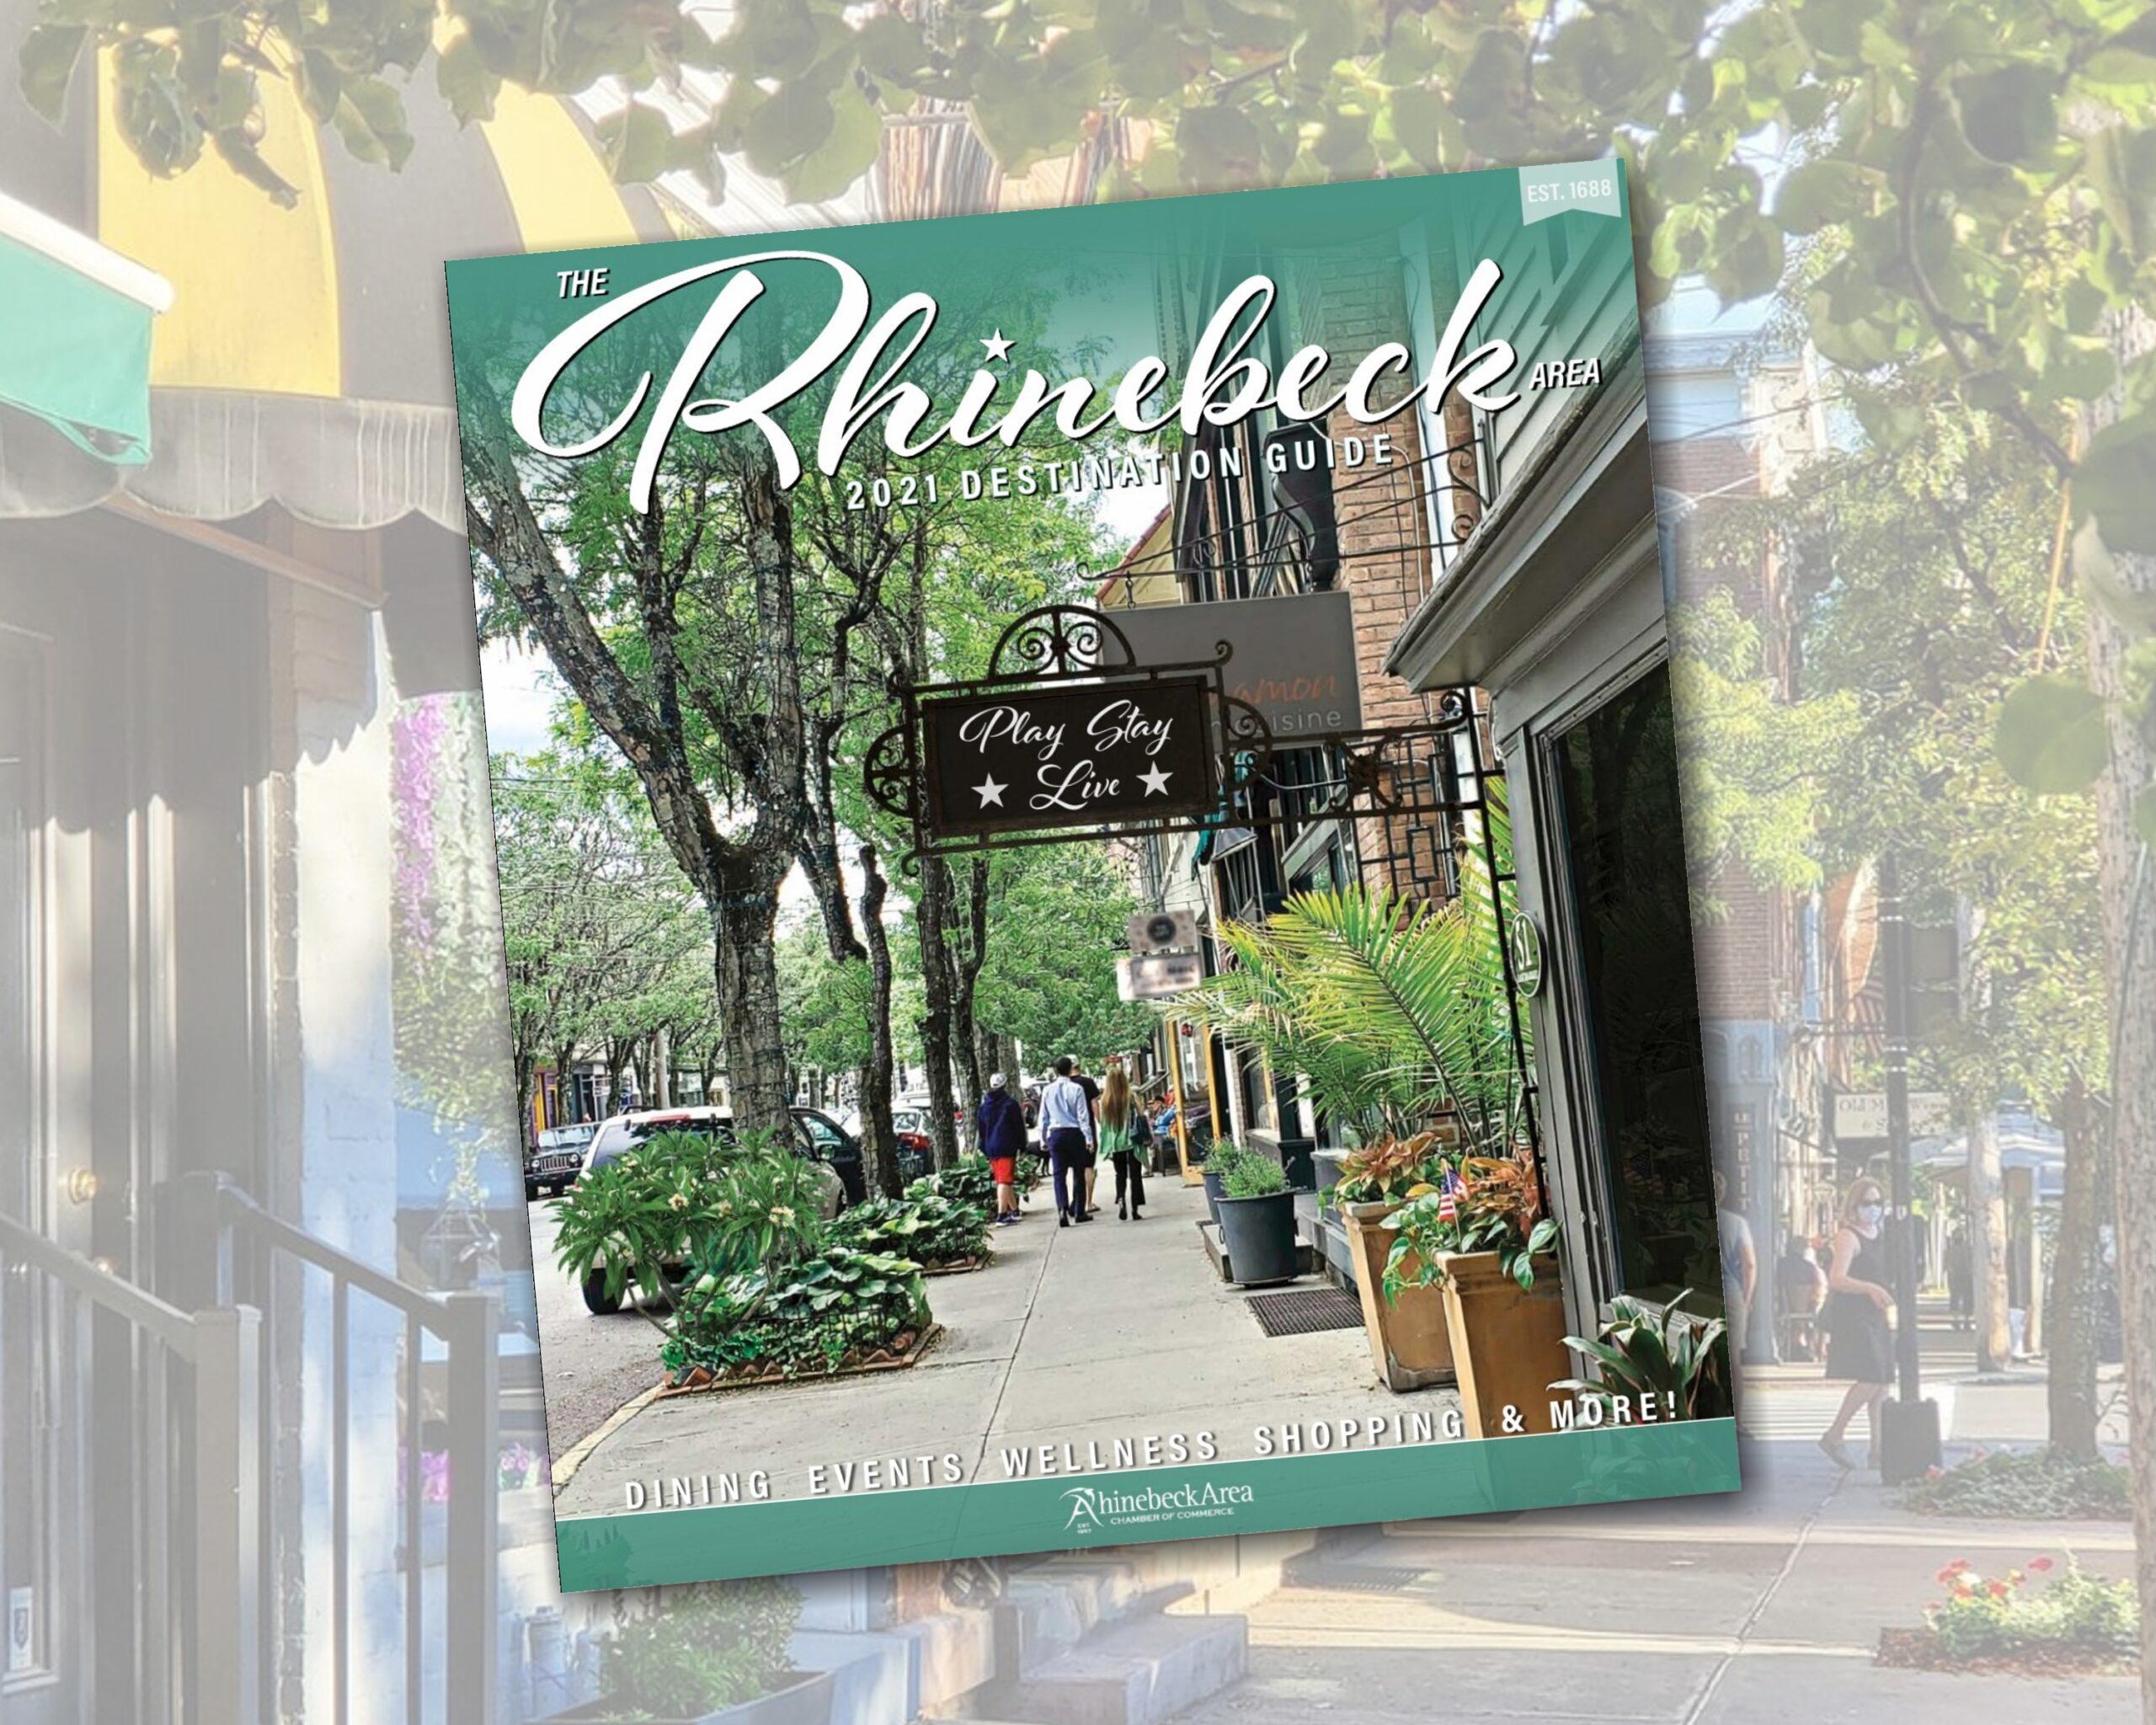 Rhinebeck Destination Guide Cover